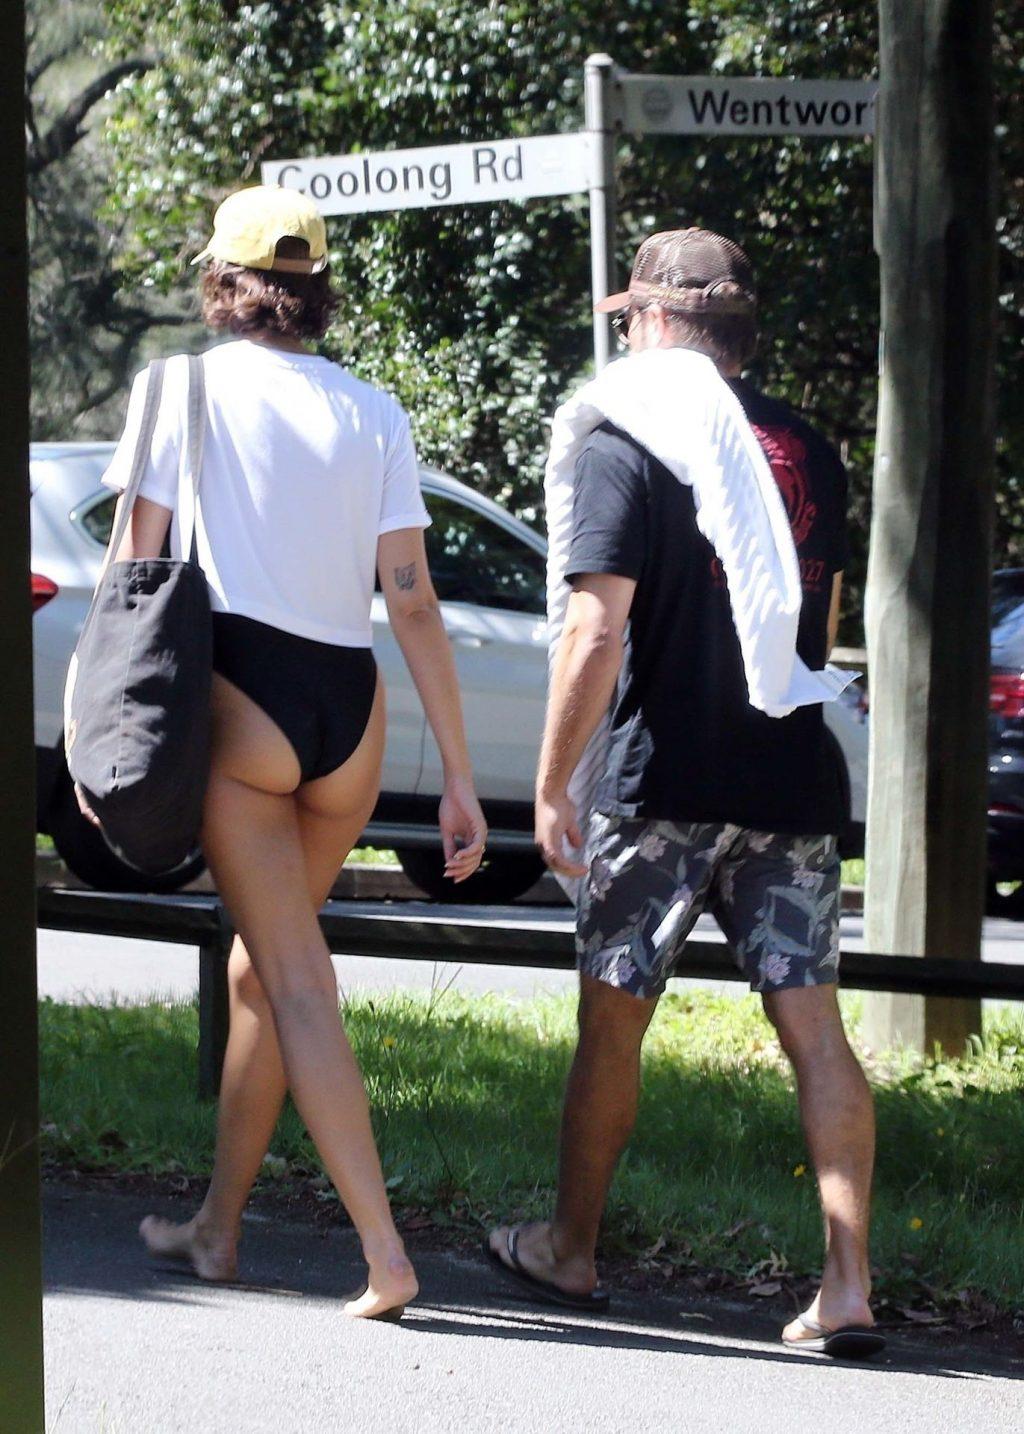 Zac Efron Enjoys a Beach Date with Vanessa Valladares in Sydney (78 Photos)